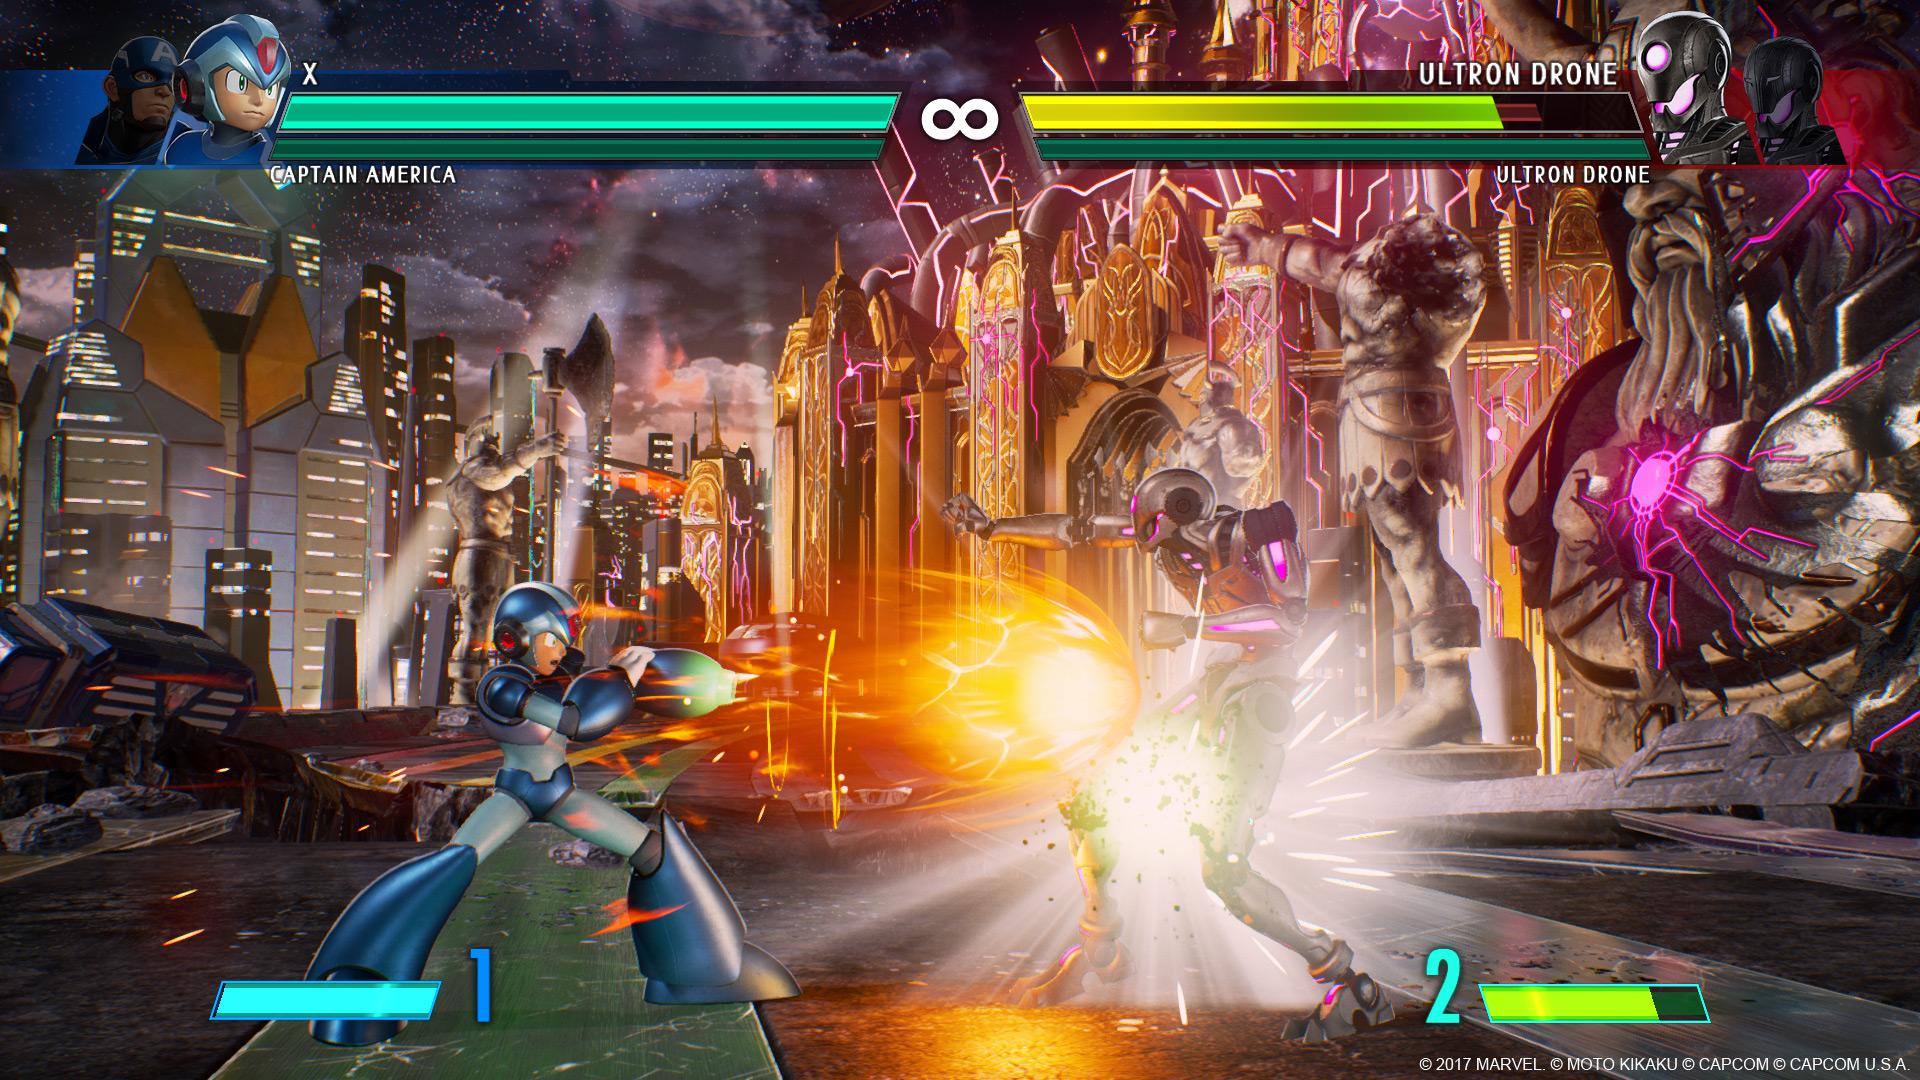 PSXSEA2017 - Marvel vs Capcom: Infinite 06